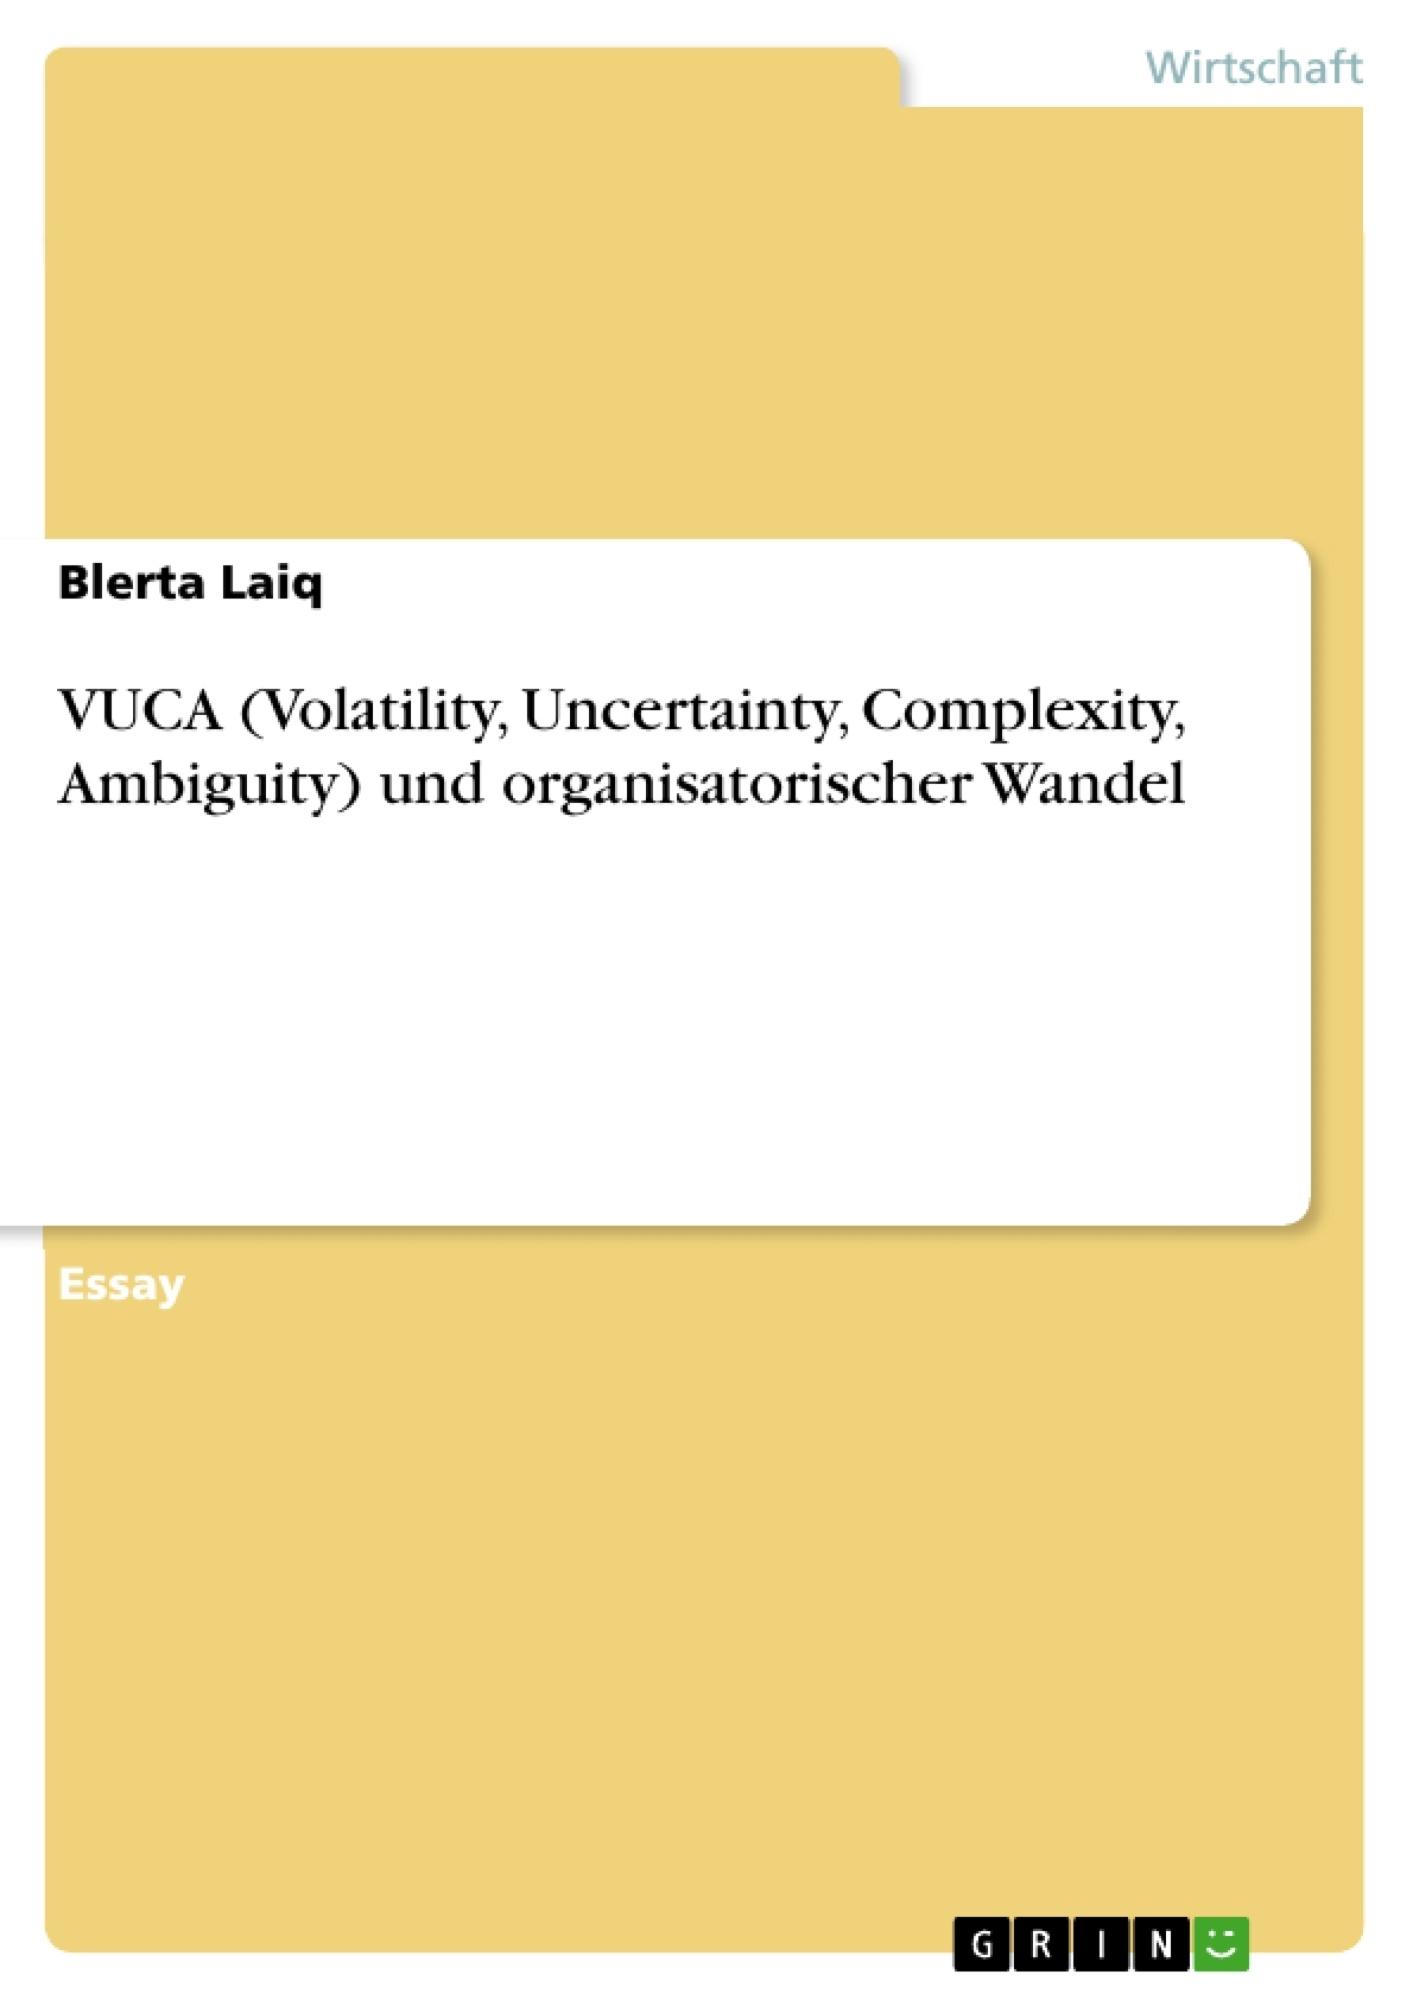 Titel: VUCA (Volatility, Uncertainty, Complexity, Ambiguity) und organisatorischer Wandel